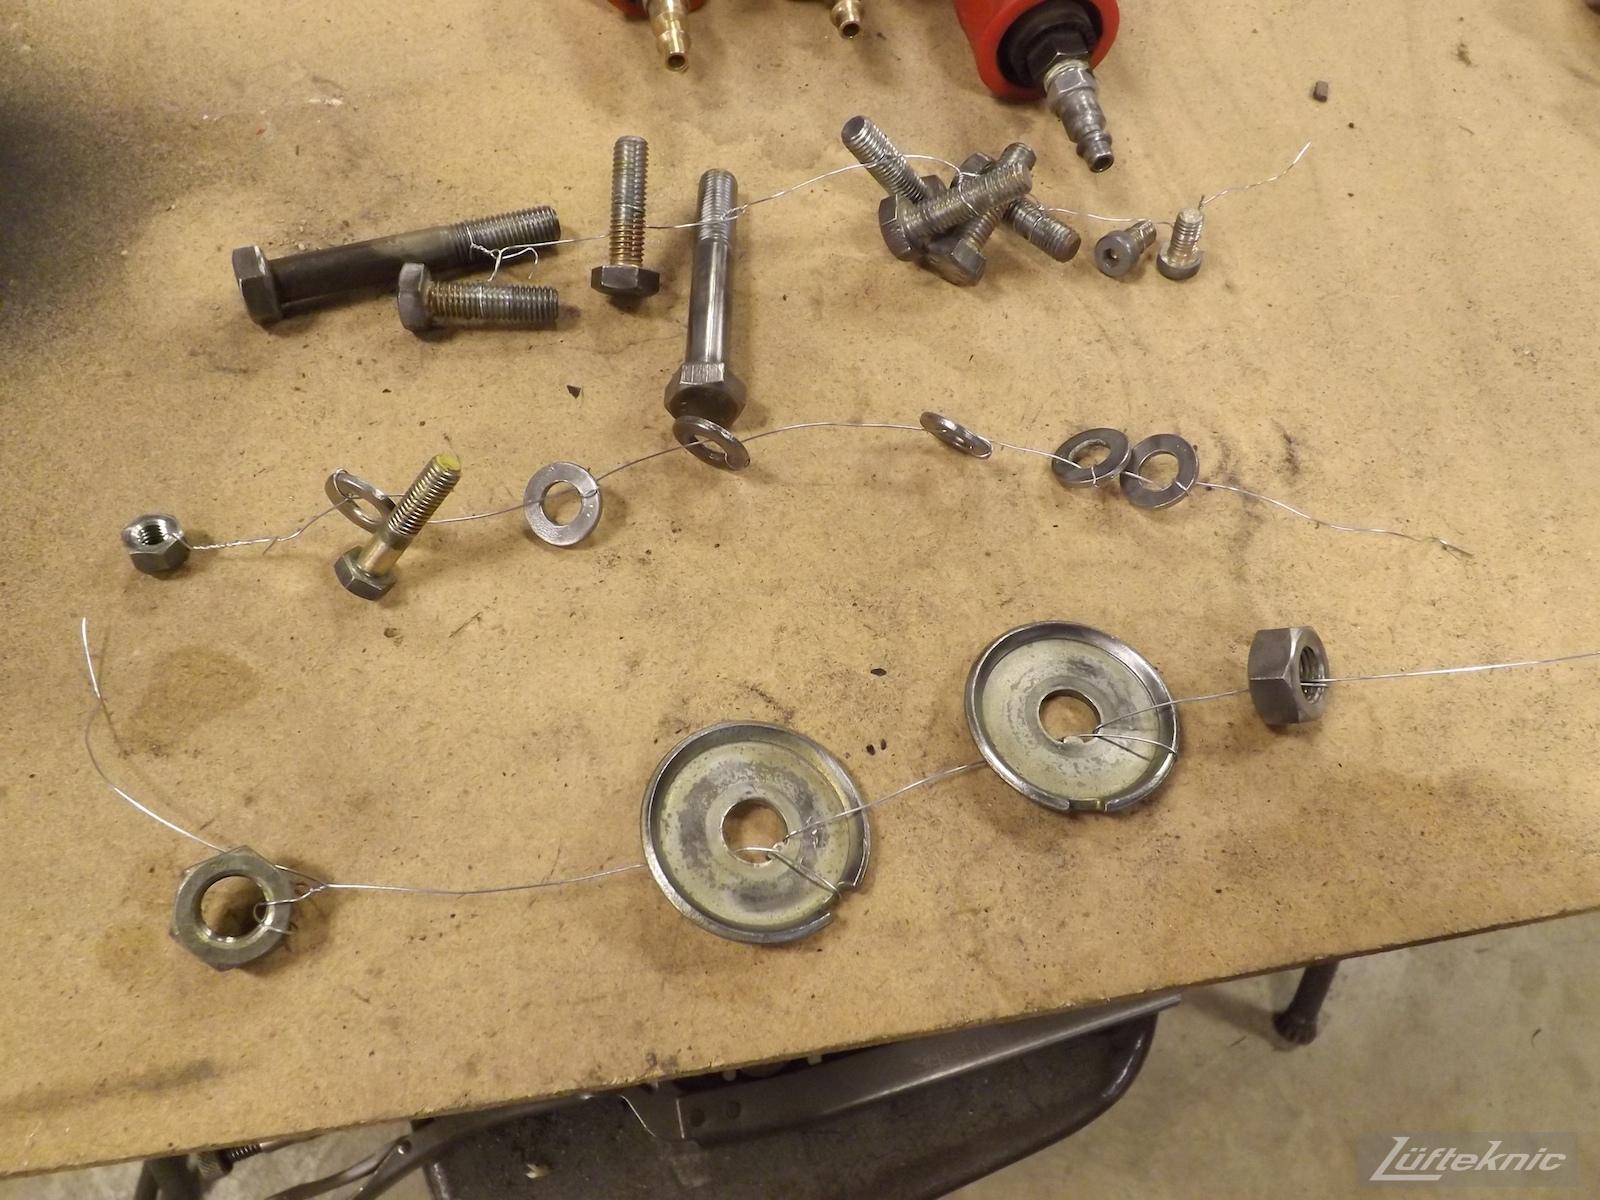 Hardware being prepped for refinishing for an Irish Green Porsche 912 undergoing restoration at Lufteknic.